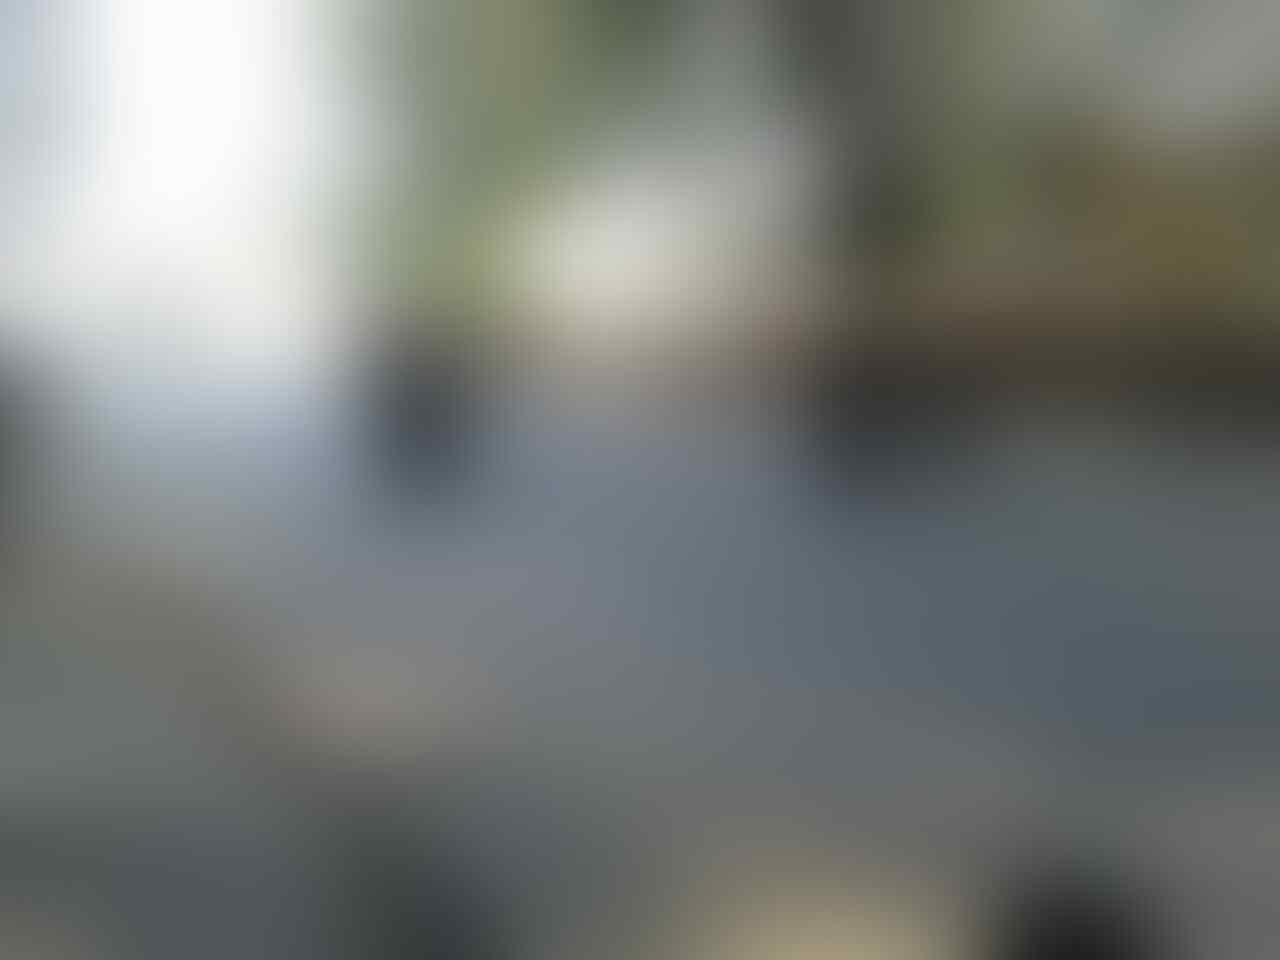 Kata Warga Soal Kerusuhan di Mako Brimob Kelapa Dua